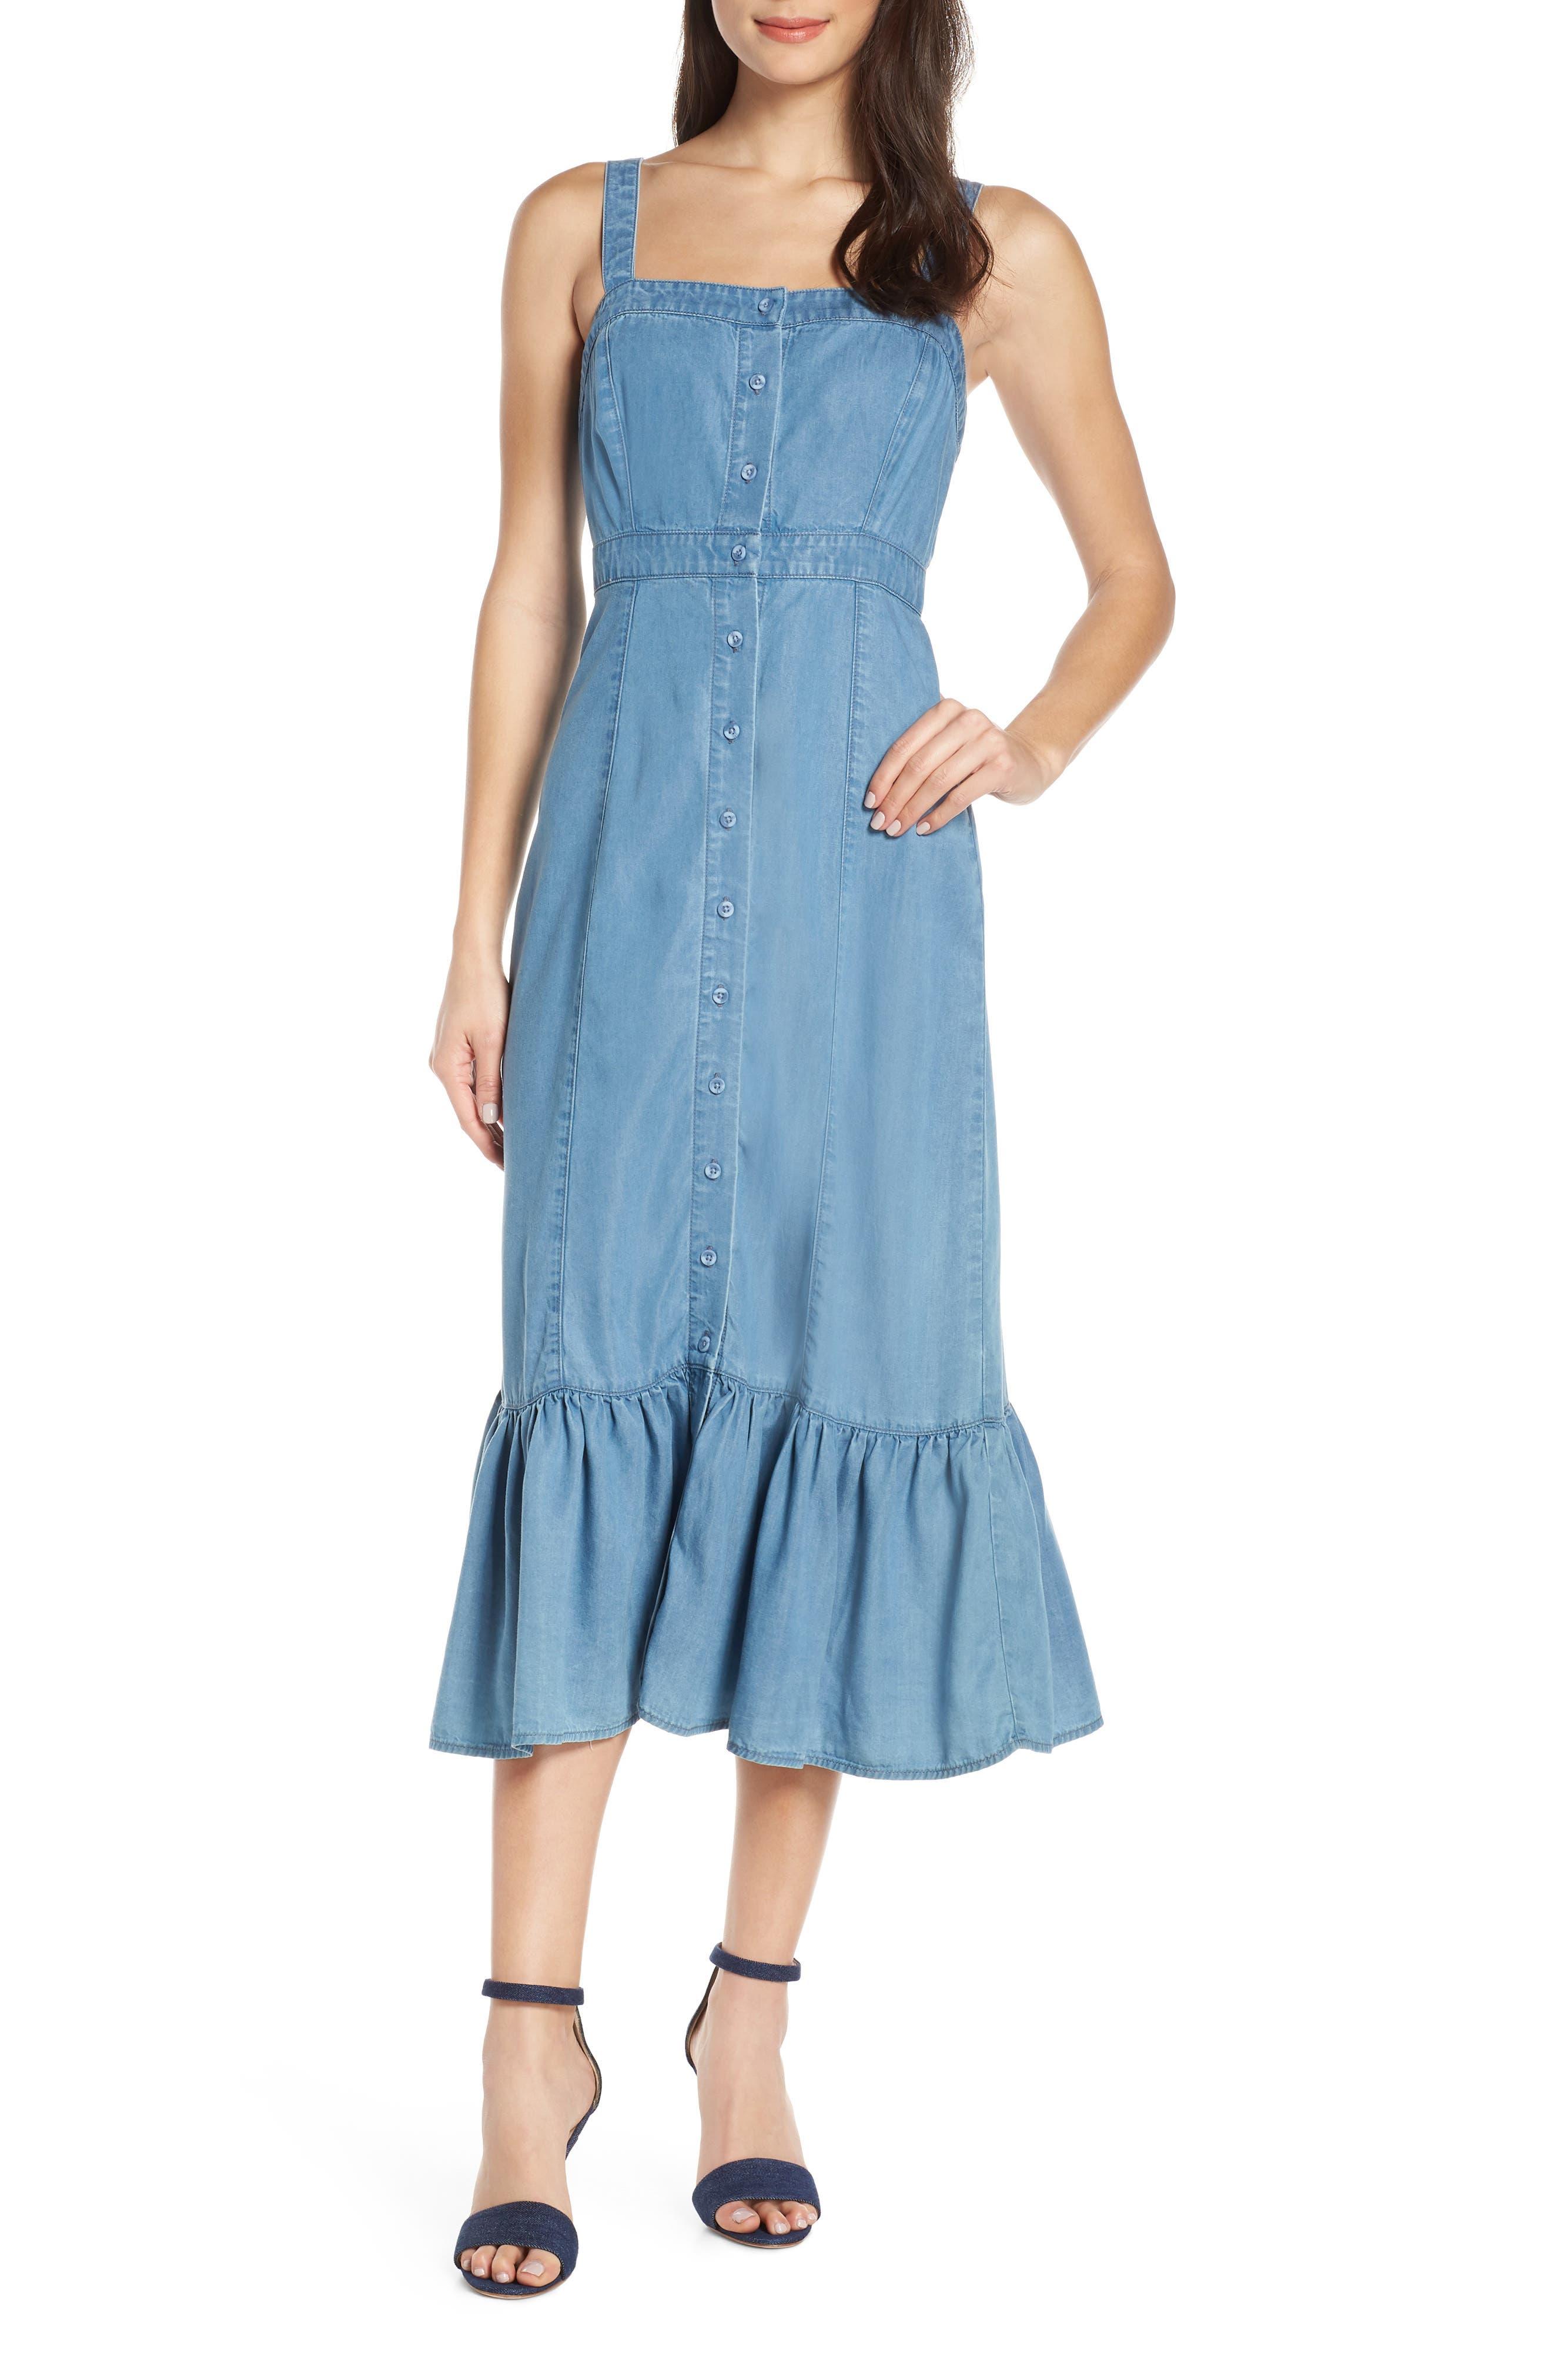 Bb Dakota Babe Next Door Denim Midi Dress, Blue